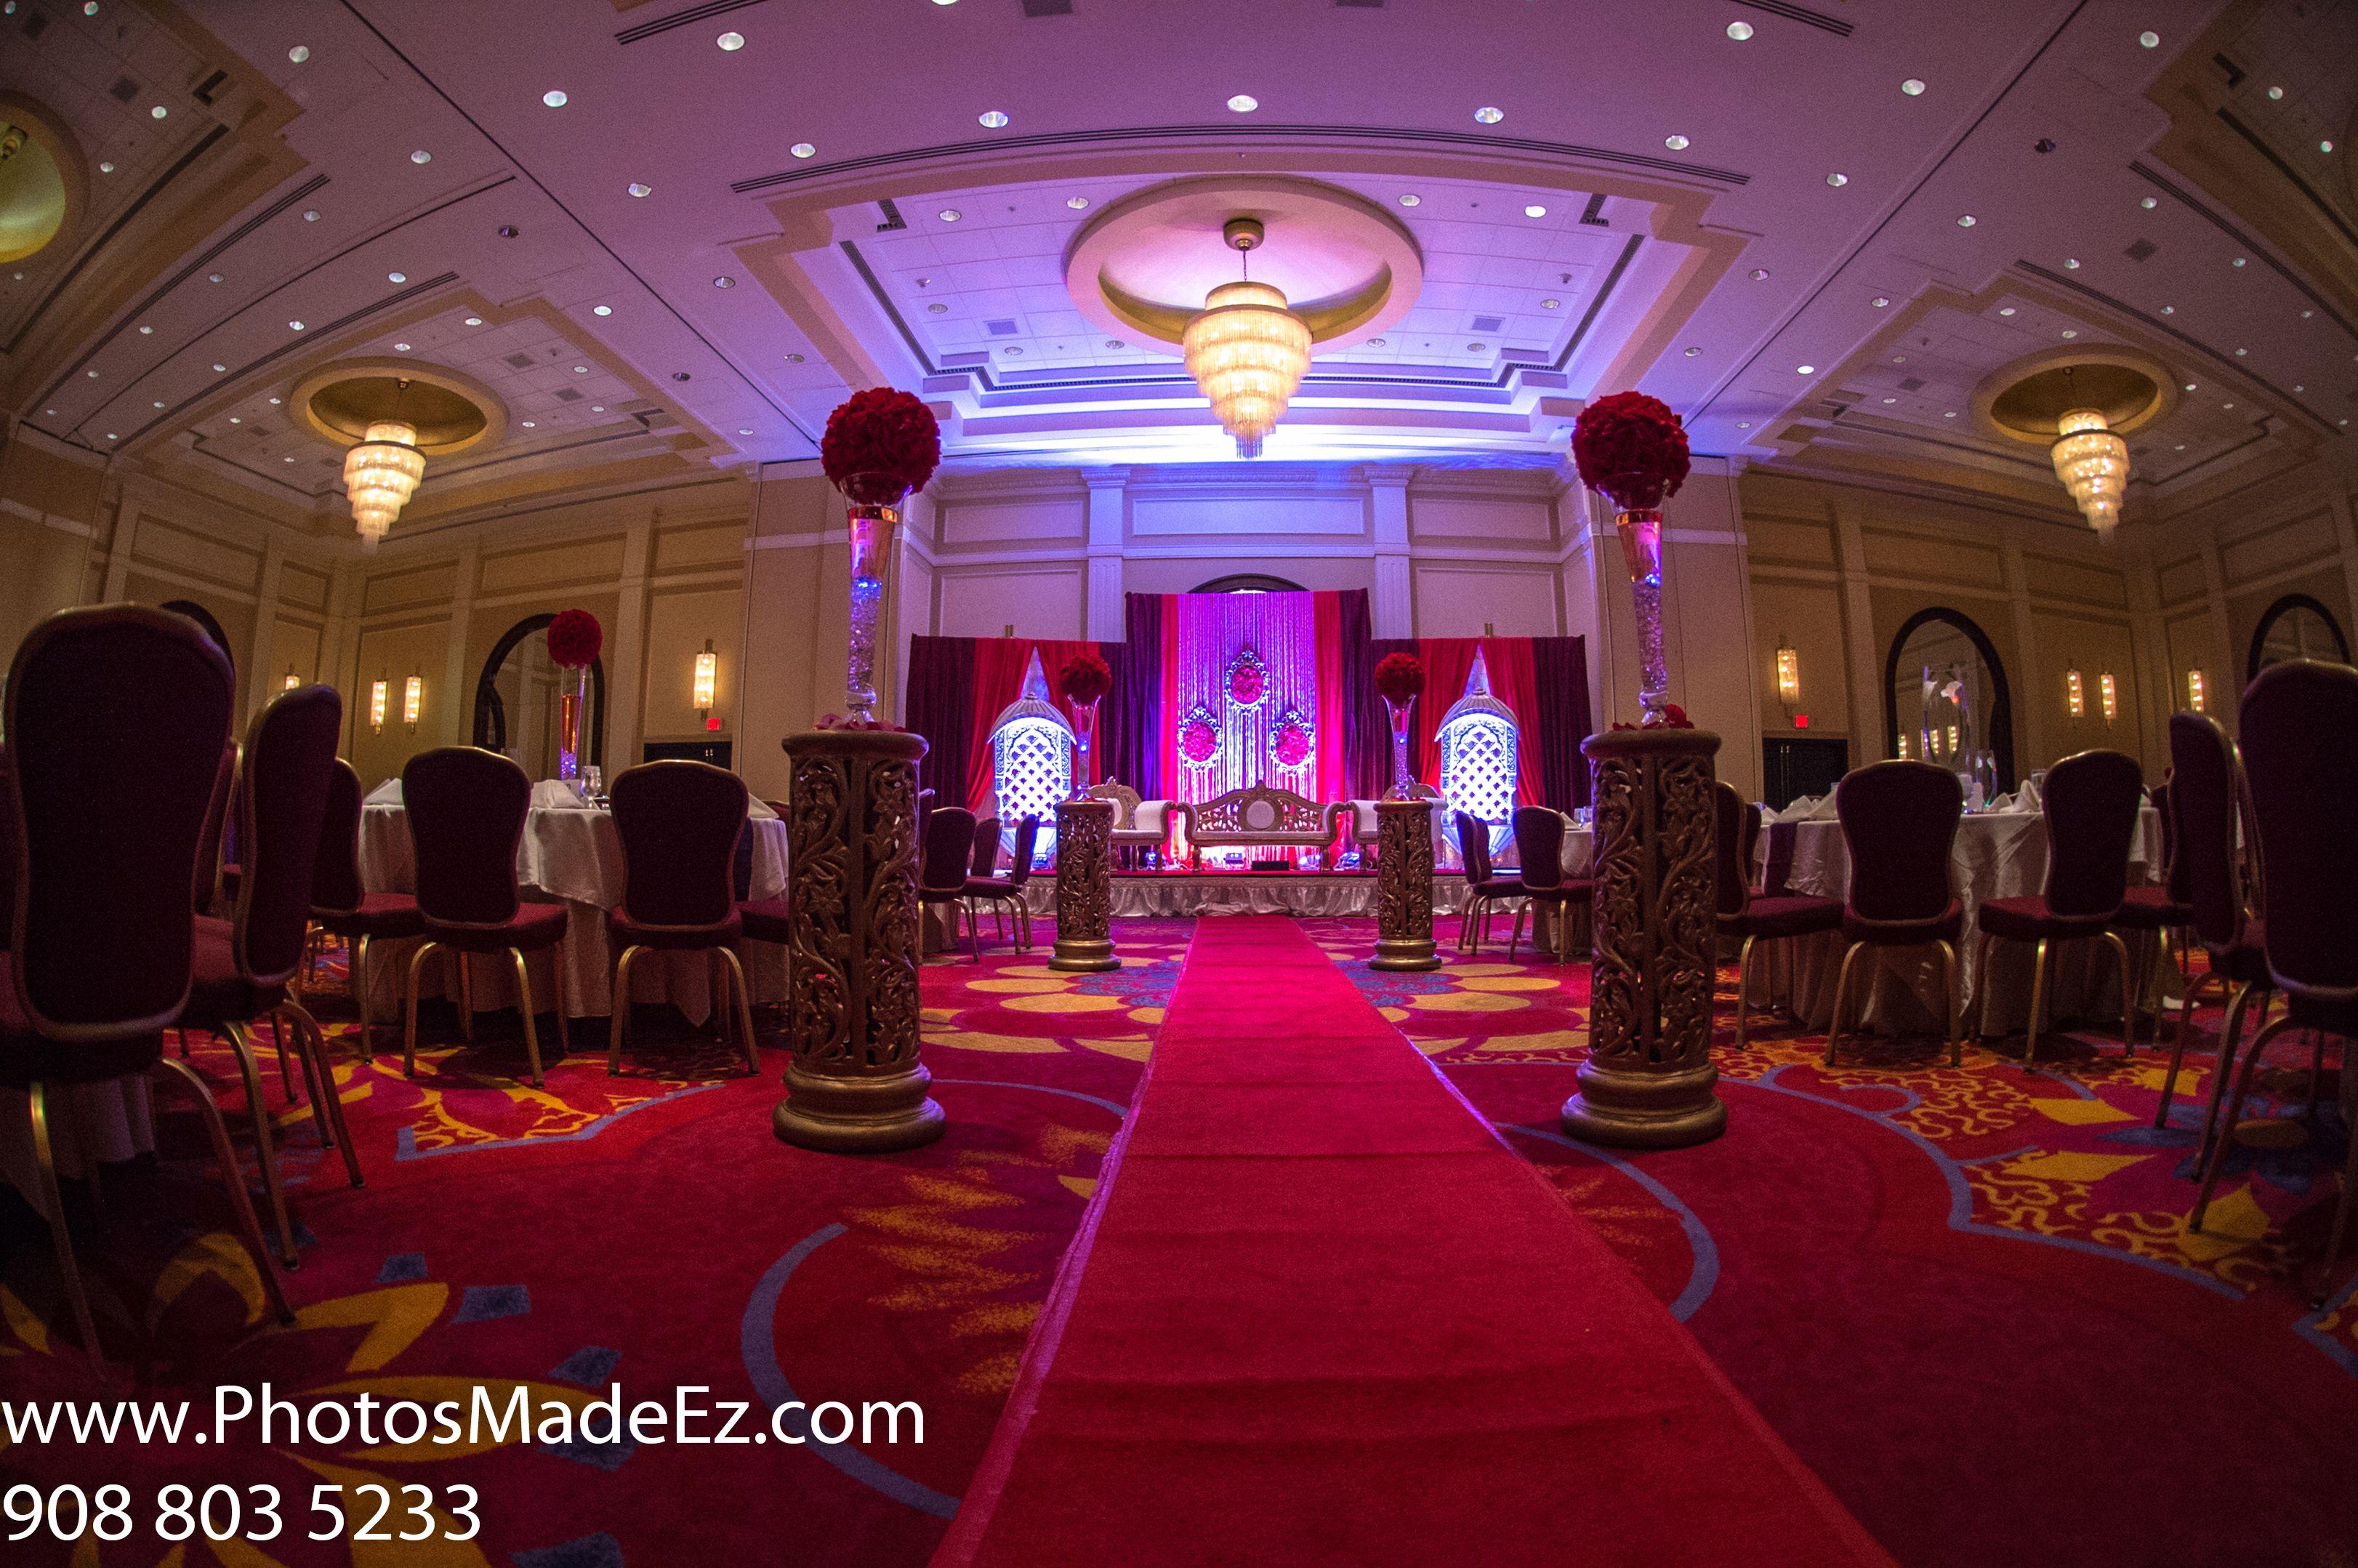 Wedding In Renaissance Woodbridge NJ For Pakistani Photographer Cinematographer PhotosMadeEz With Fellow